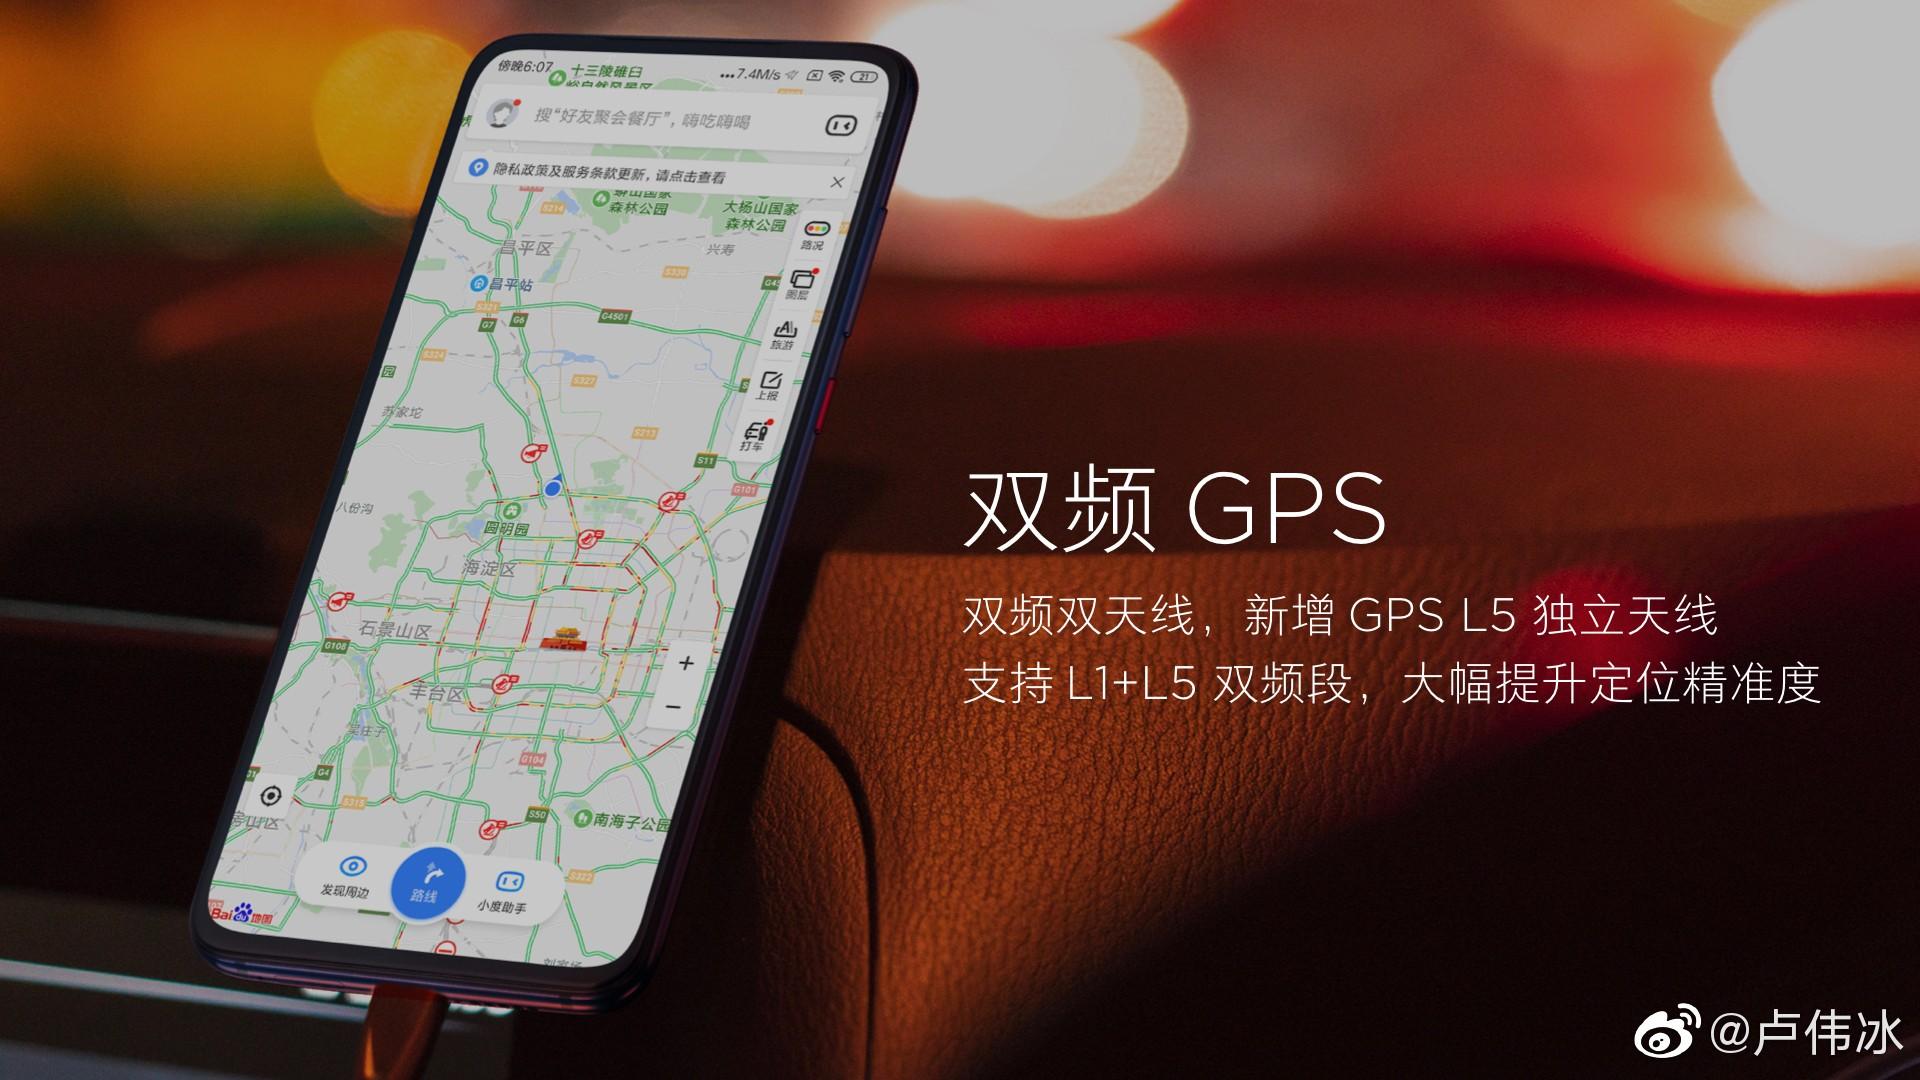 Redmi K20 GPS: L1+L5 dual band